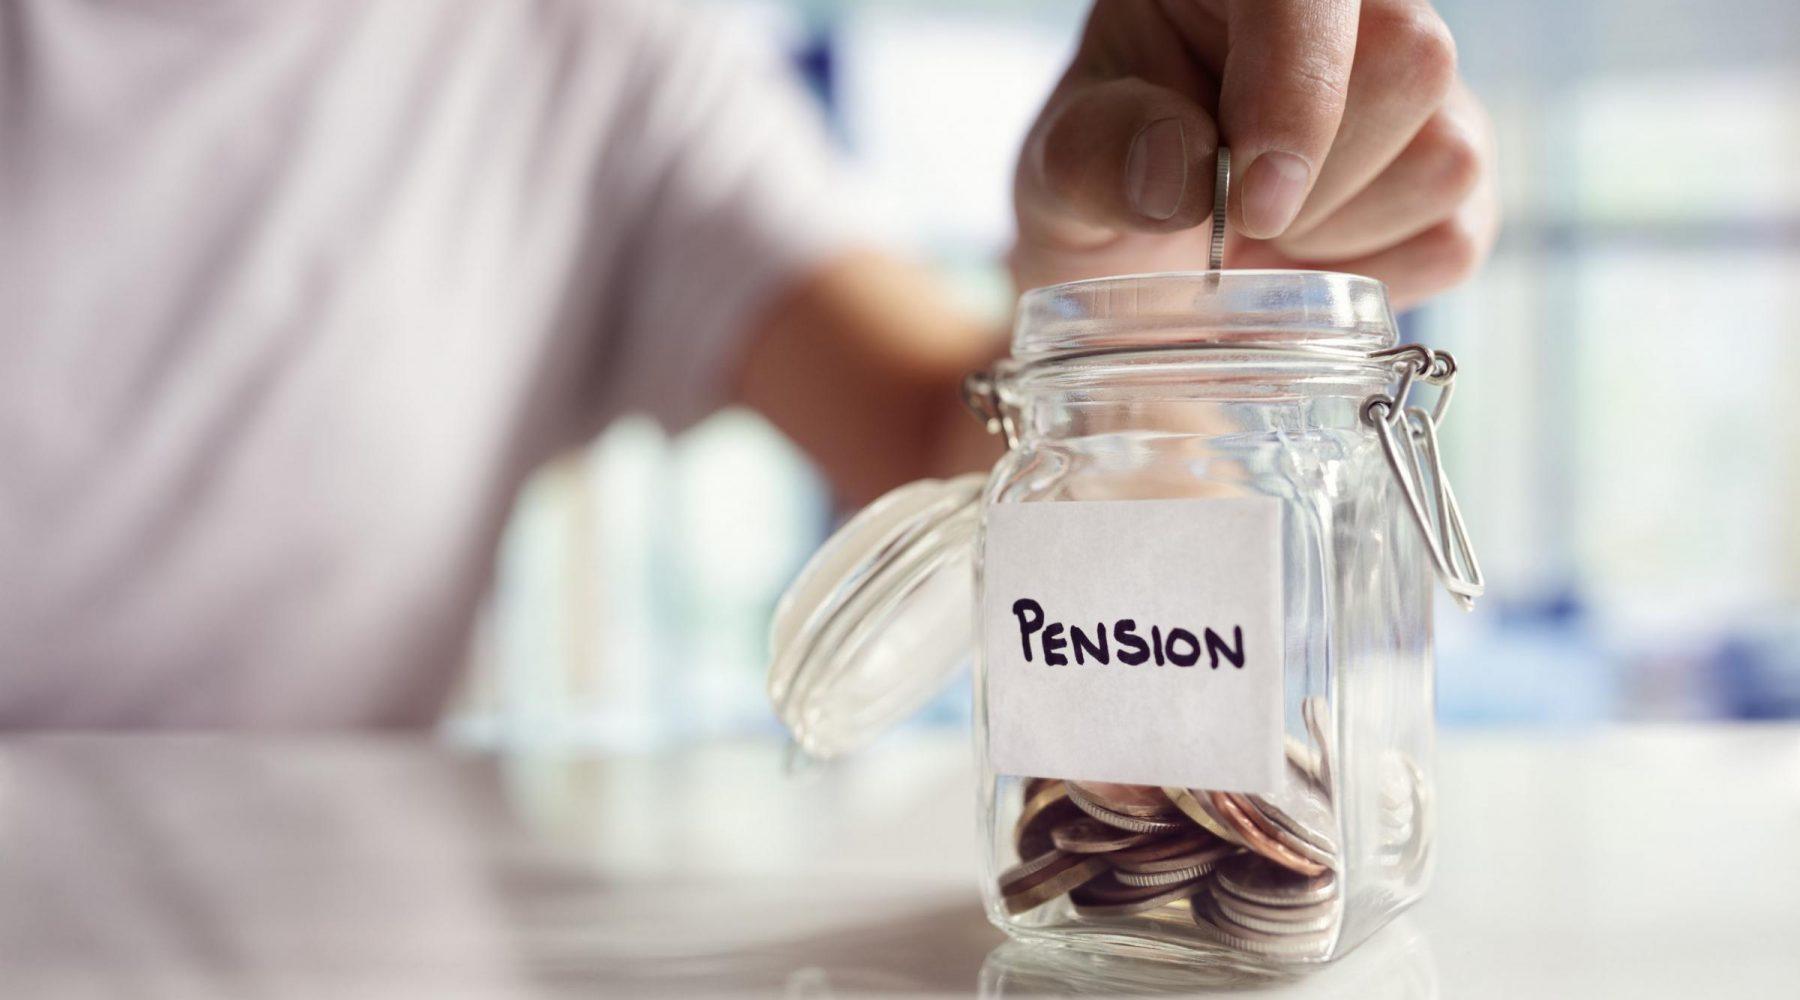 Don't panic on finances – advice